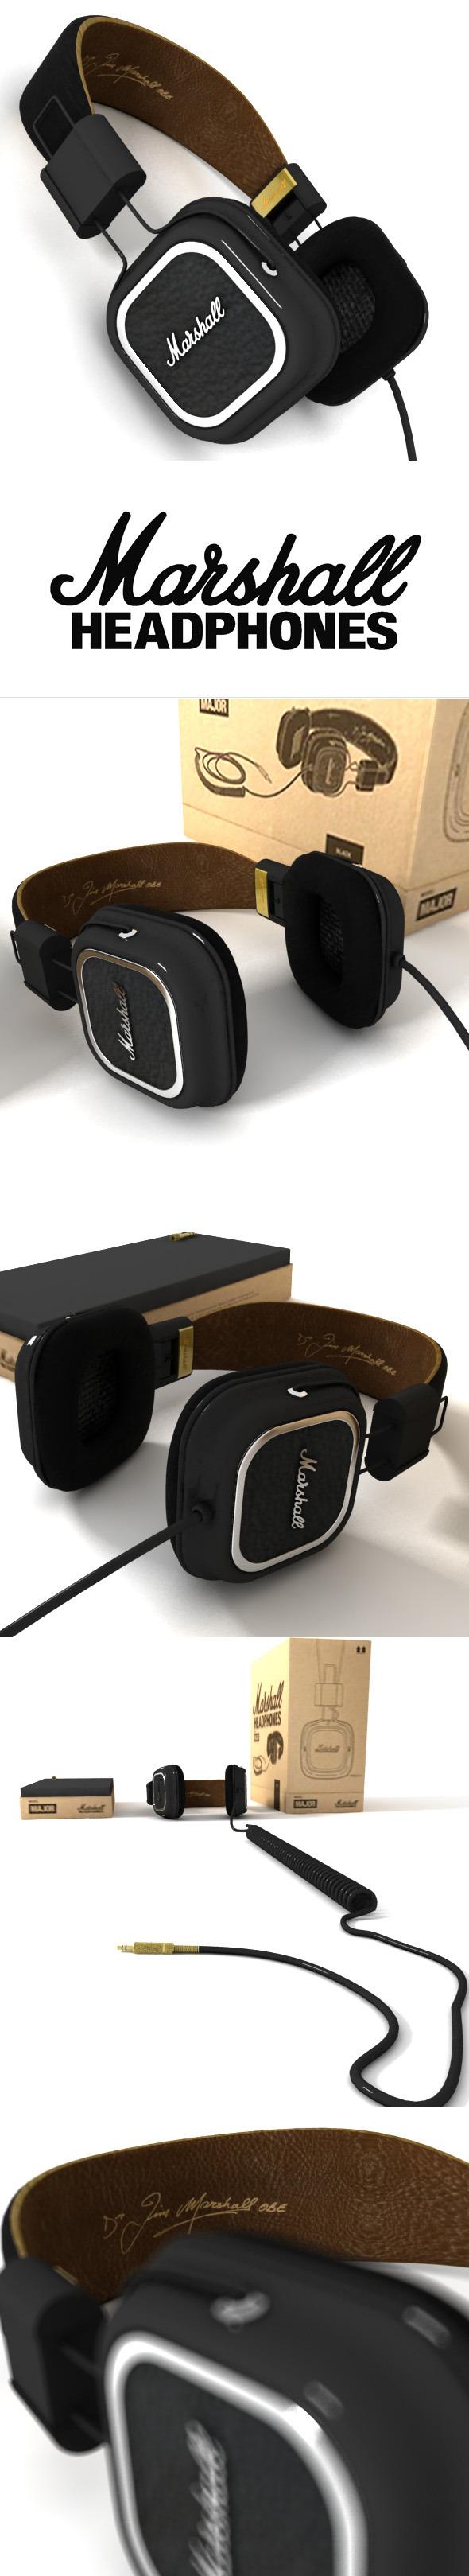 Marshall Headphones Major - 3DOcean Item for Sale